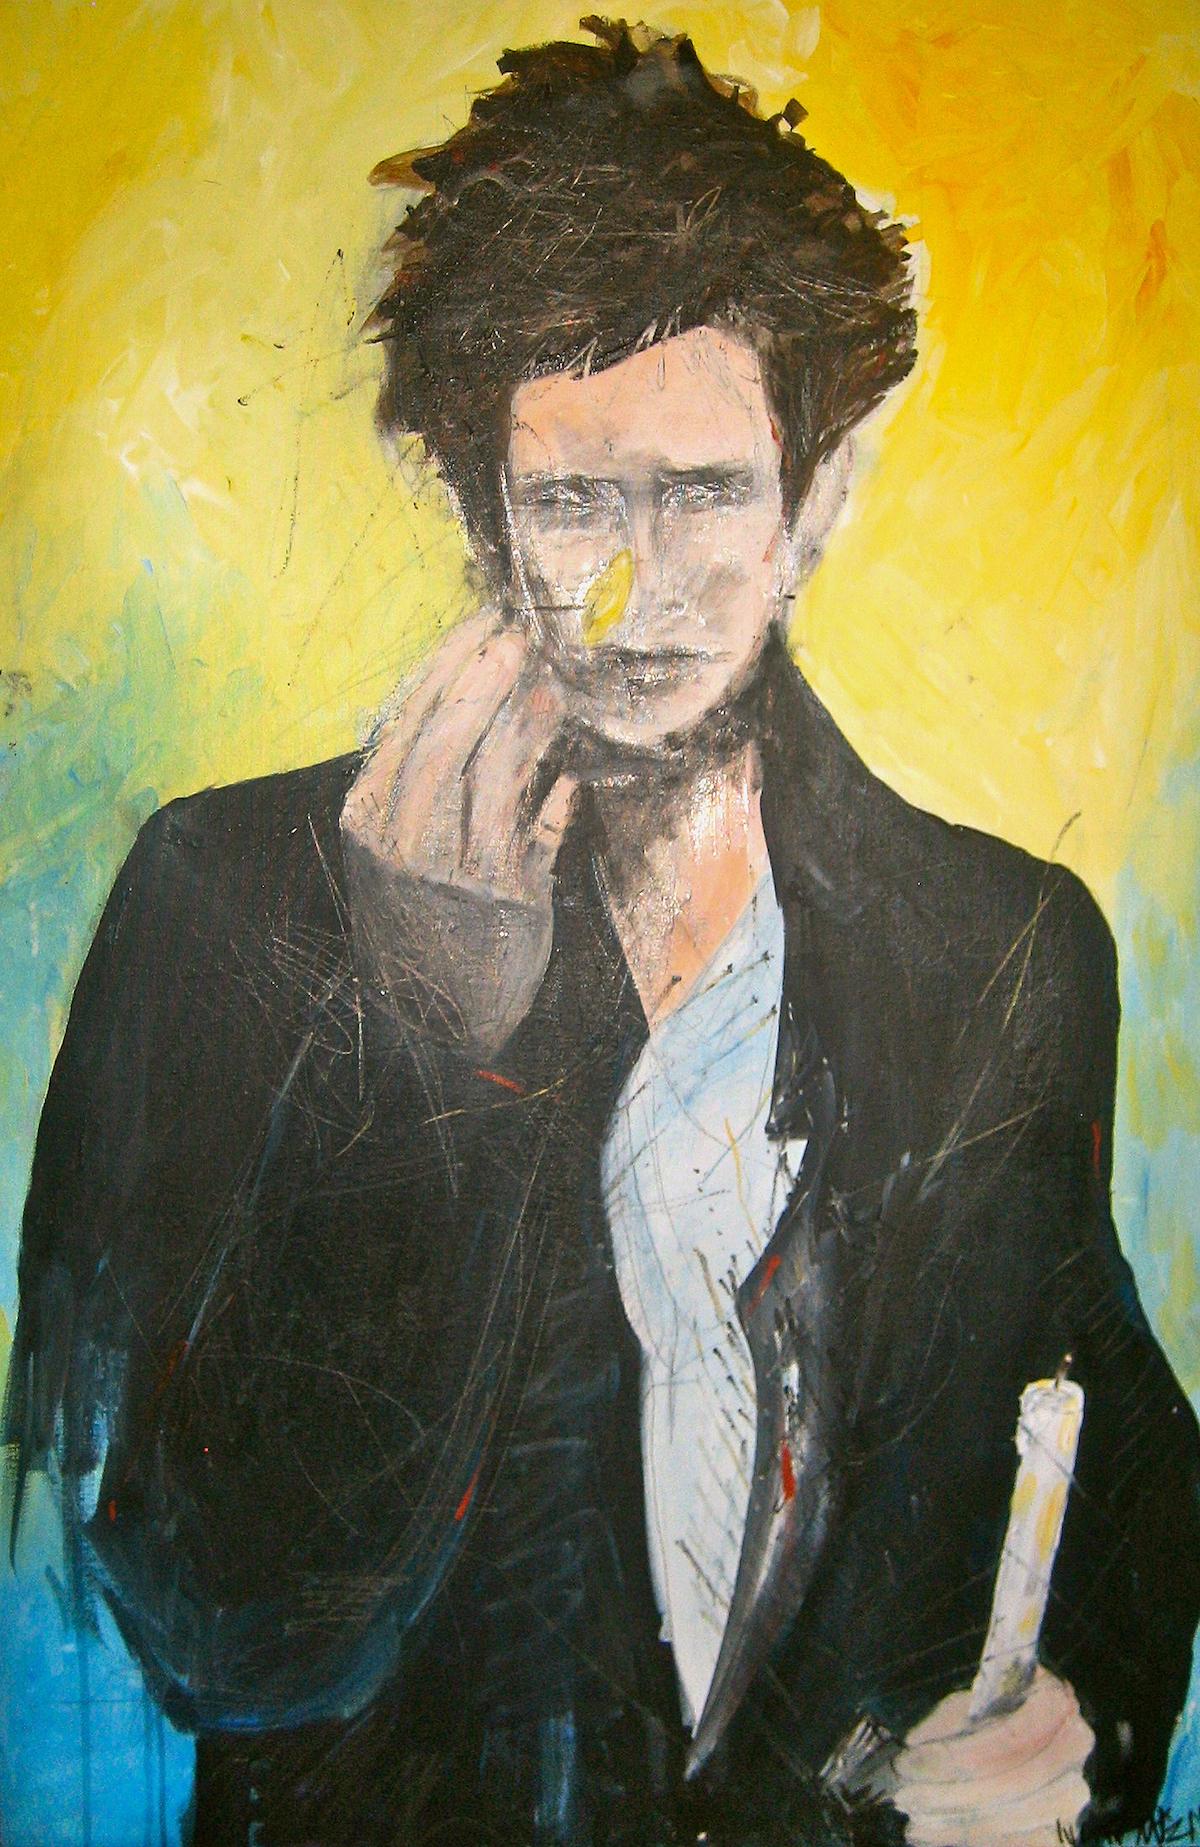 """Jeff Buckley"" Acrylic on Canvas 24""x36"""